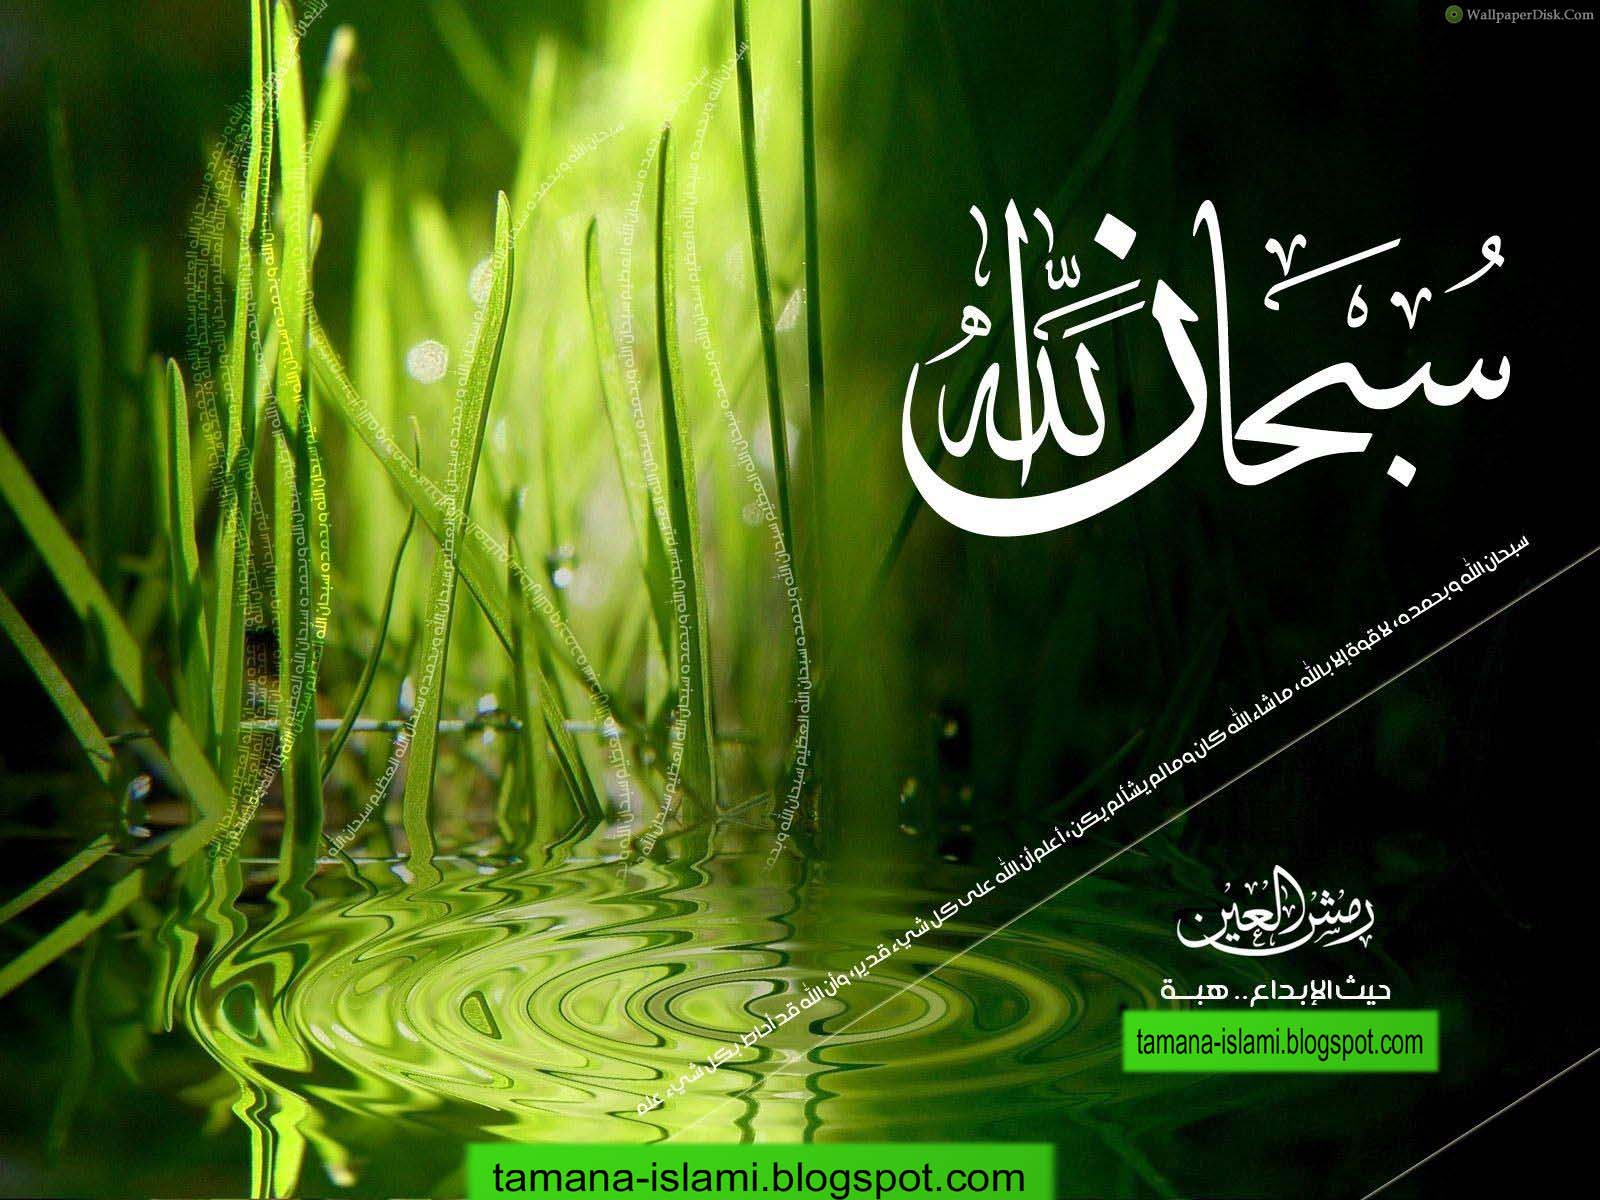 TAMANAISLAMI Subhan_Allah